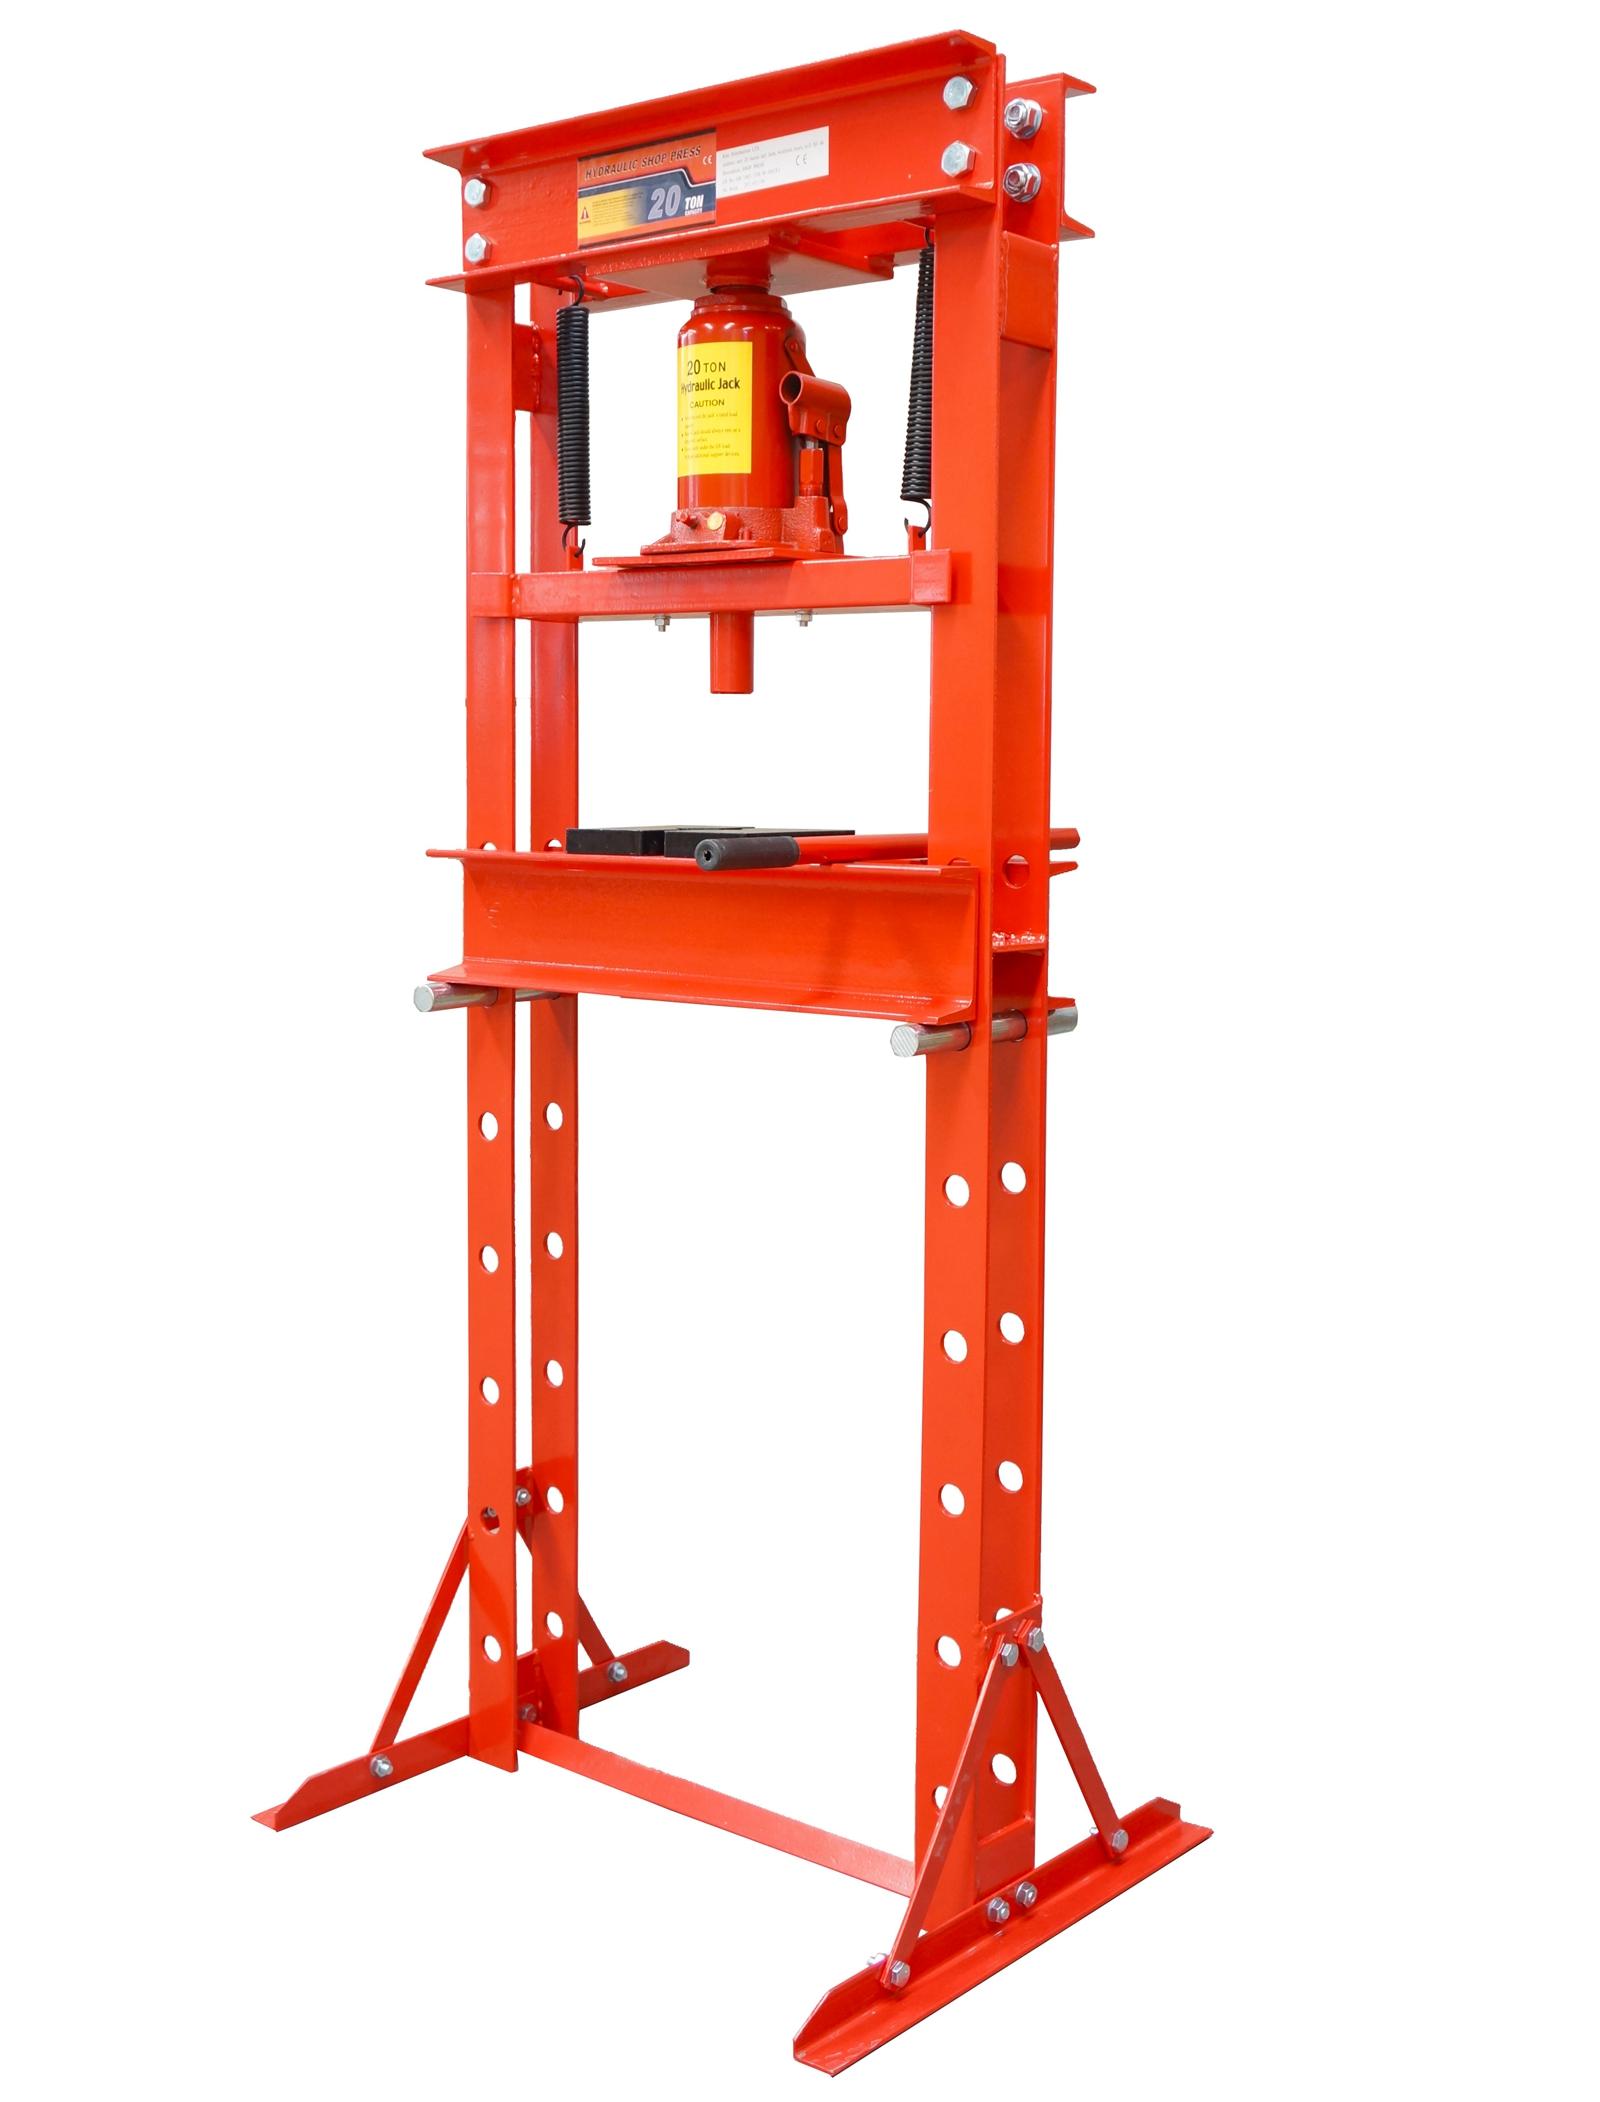 20 Ton Shop Floor Press Workshop Hydraulic 20 Tonne